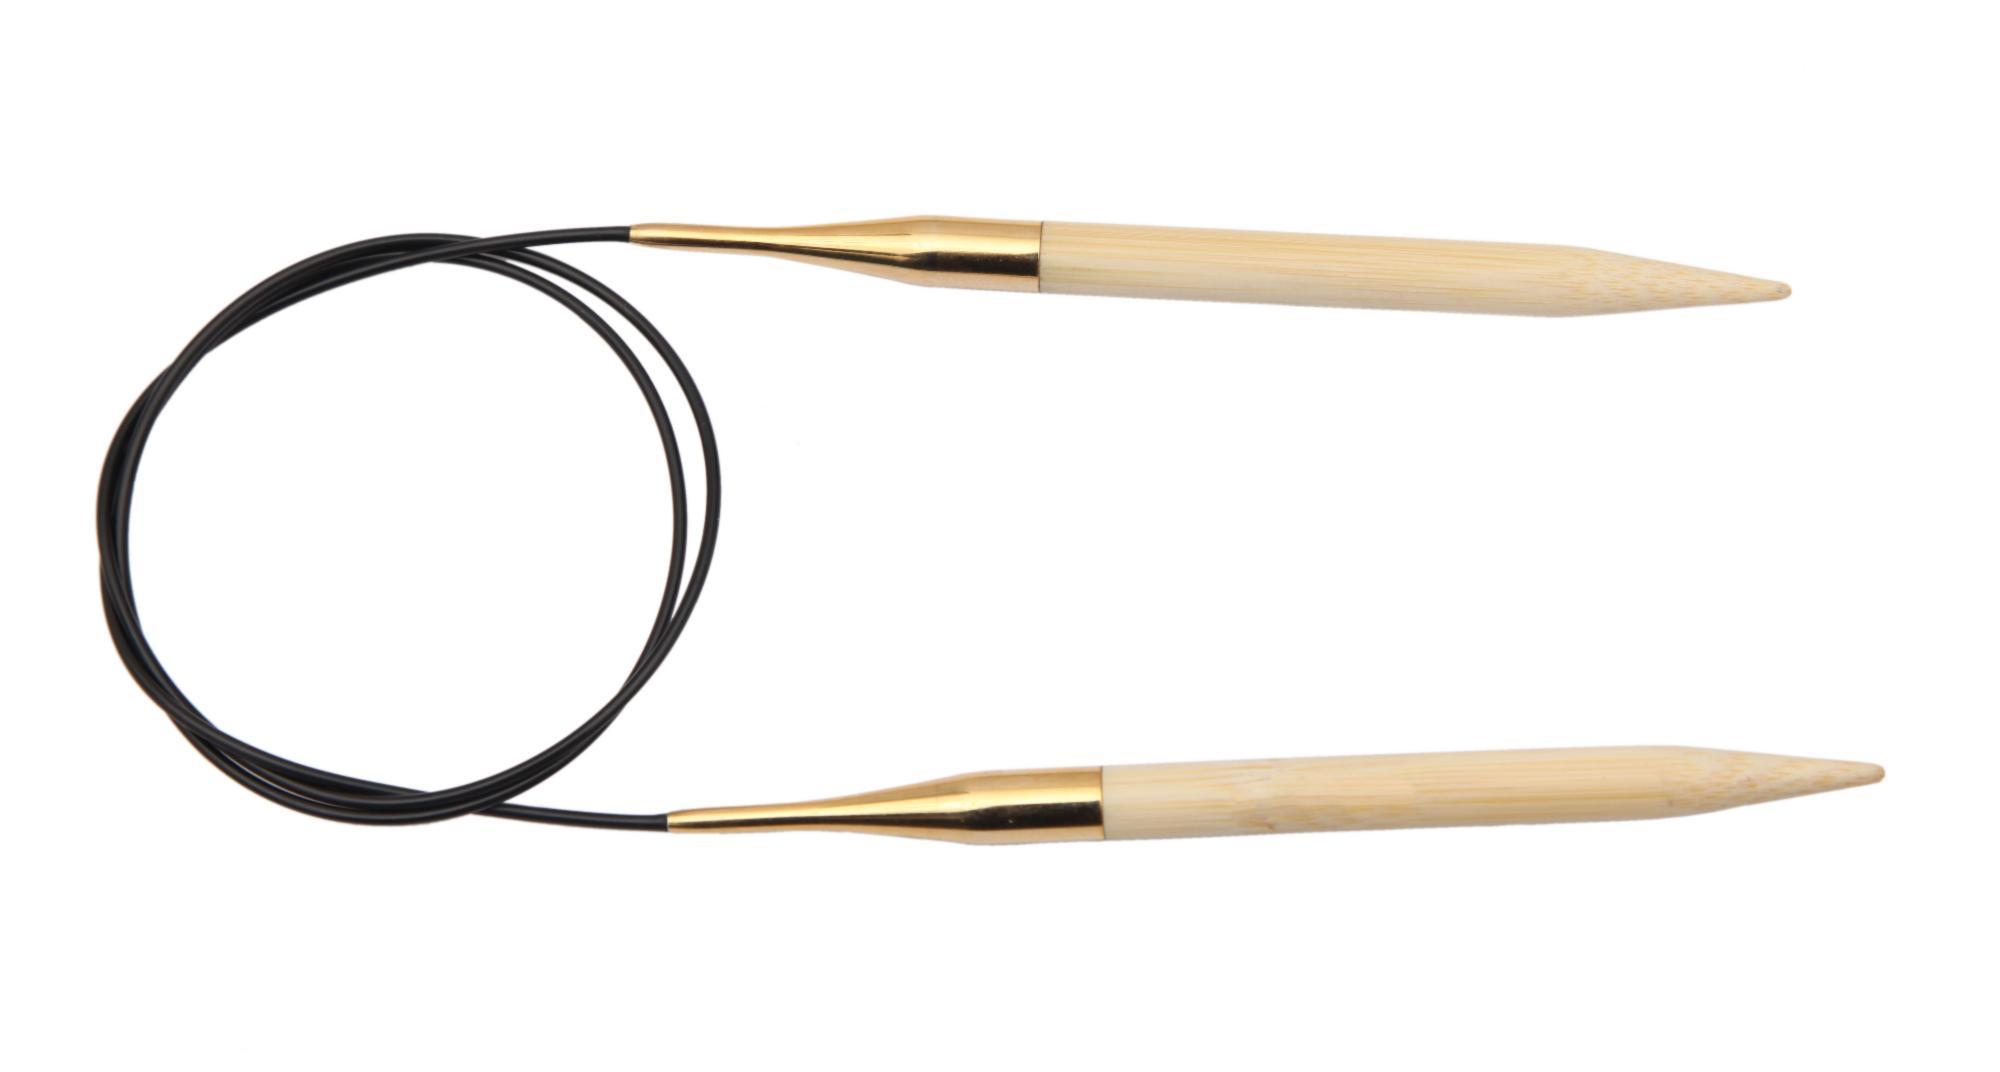 Спицы круговые 40 см Bamboo KnitPro, 22204, 2.75 мм